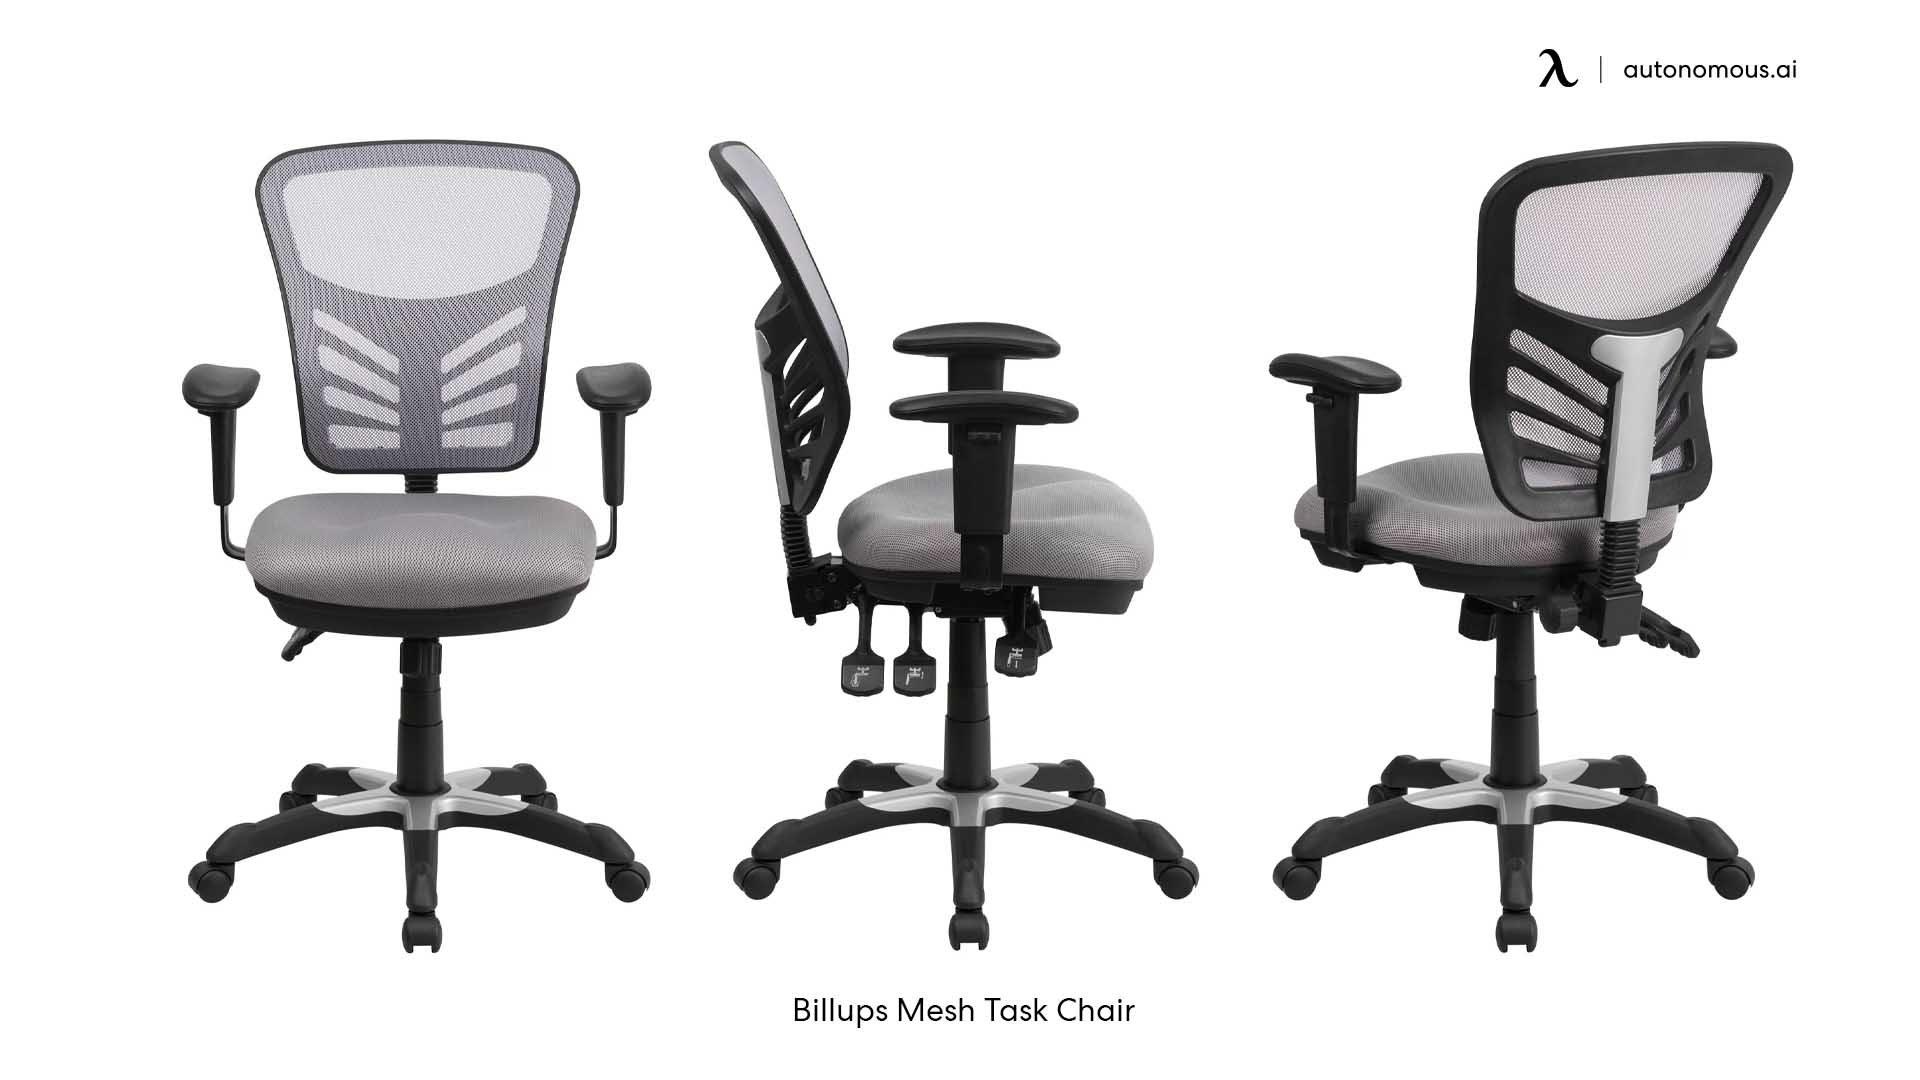 Billups Mesh Task Chair